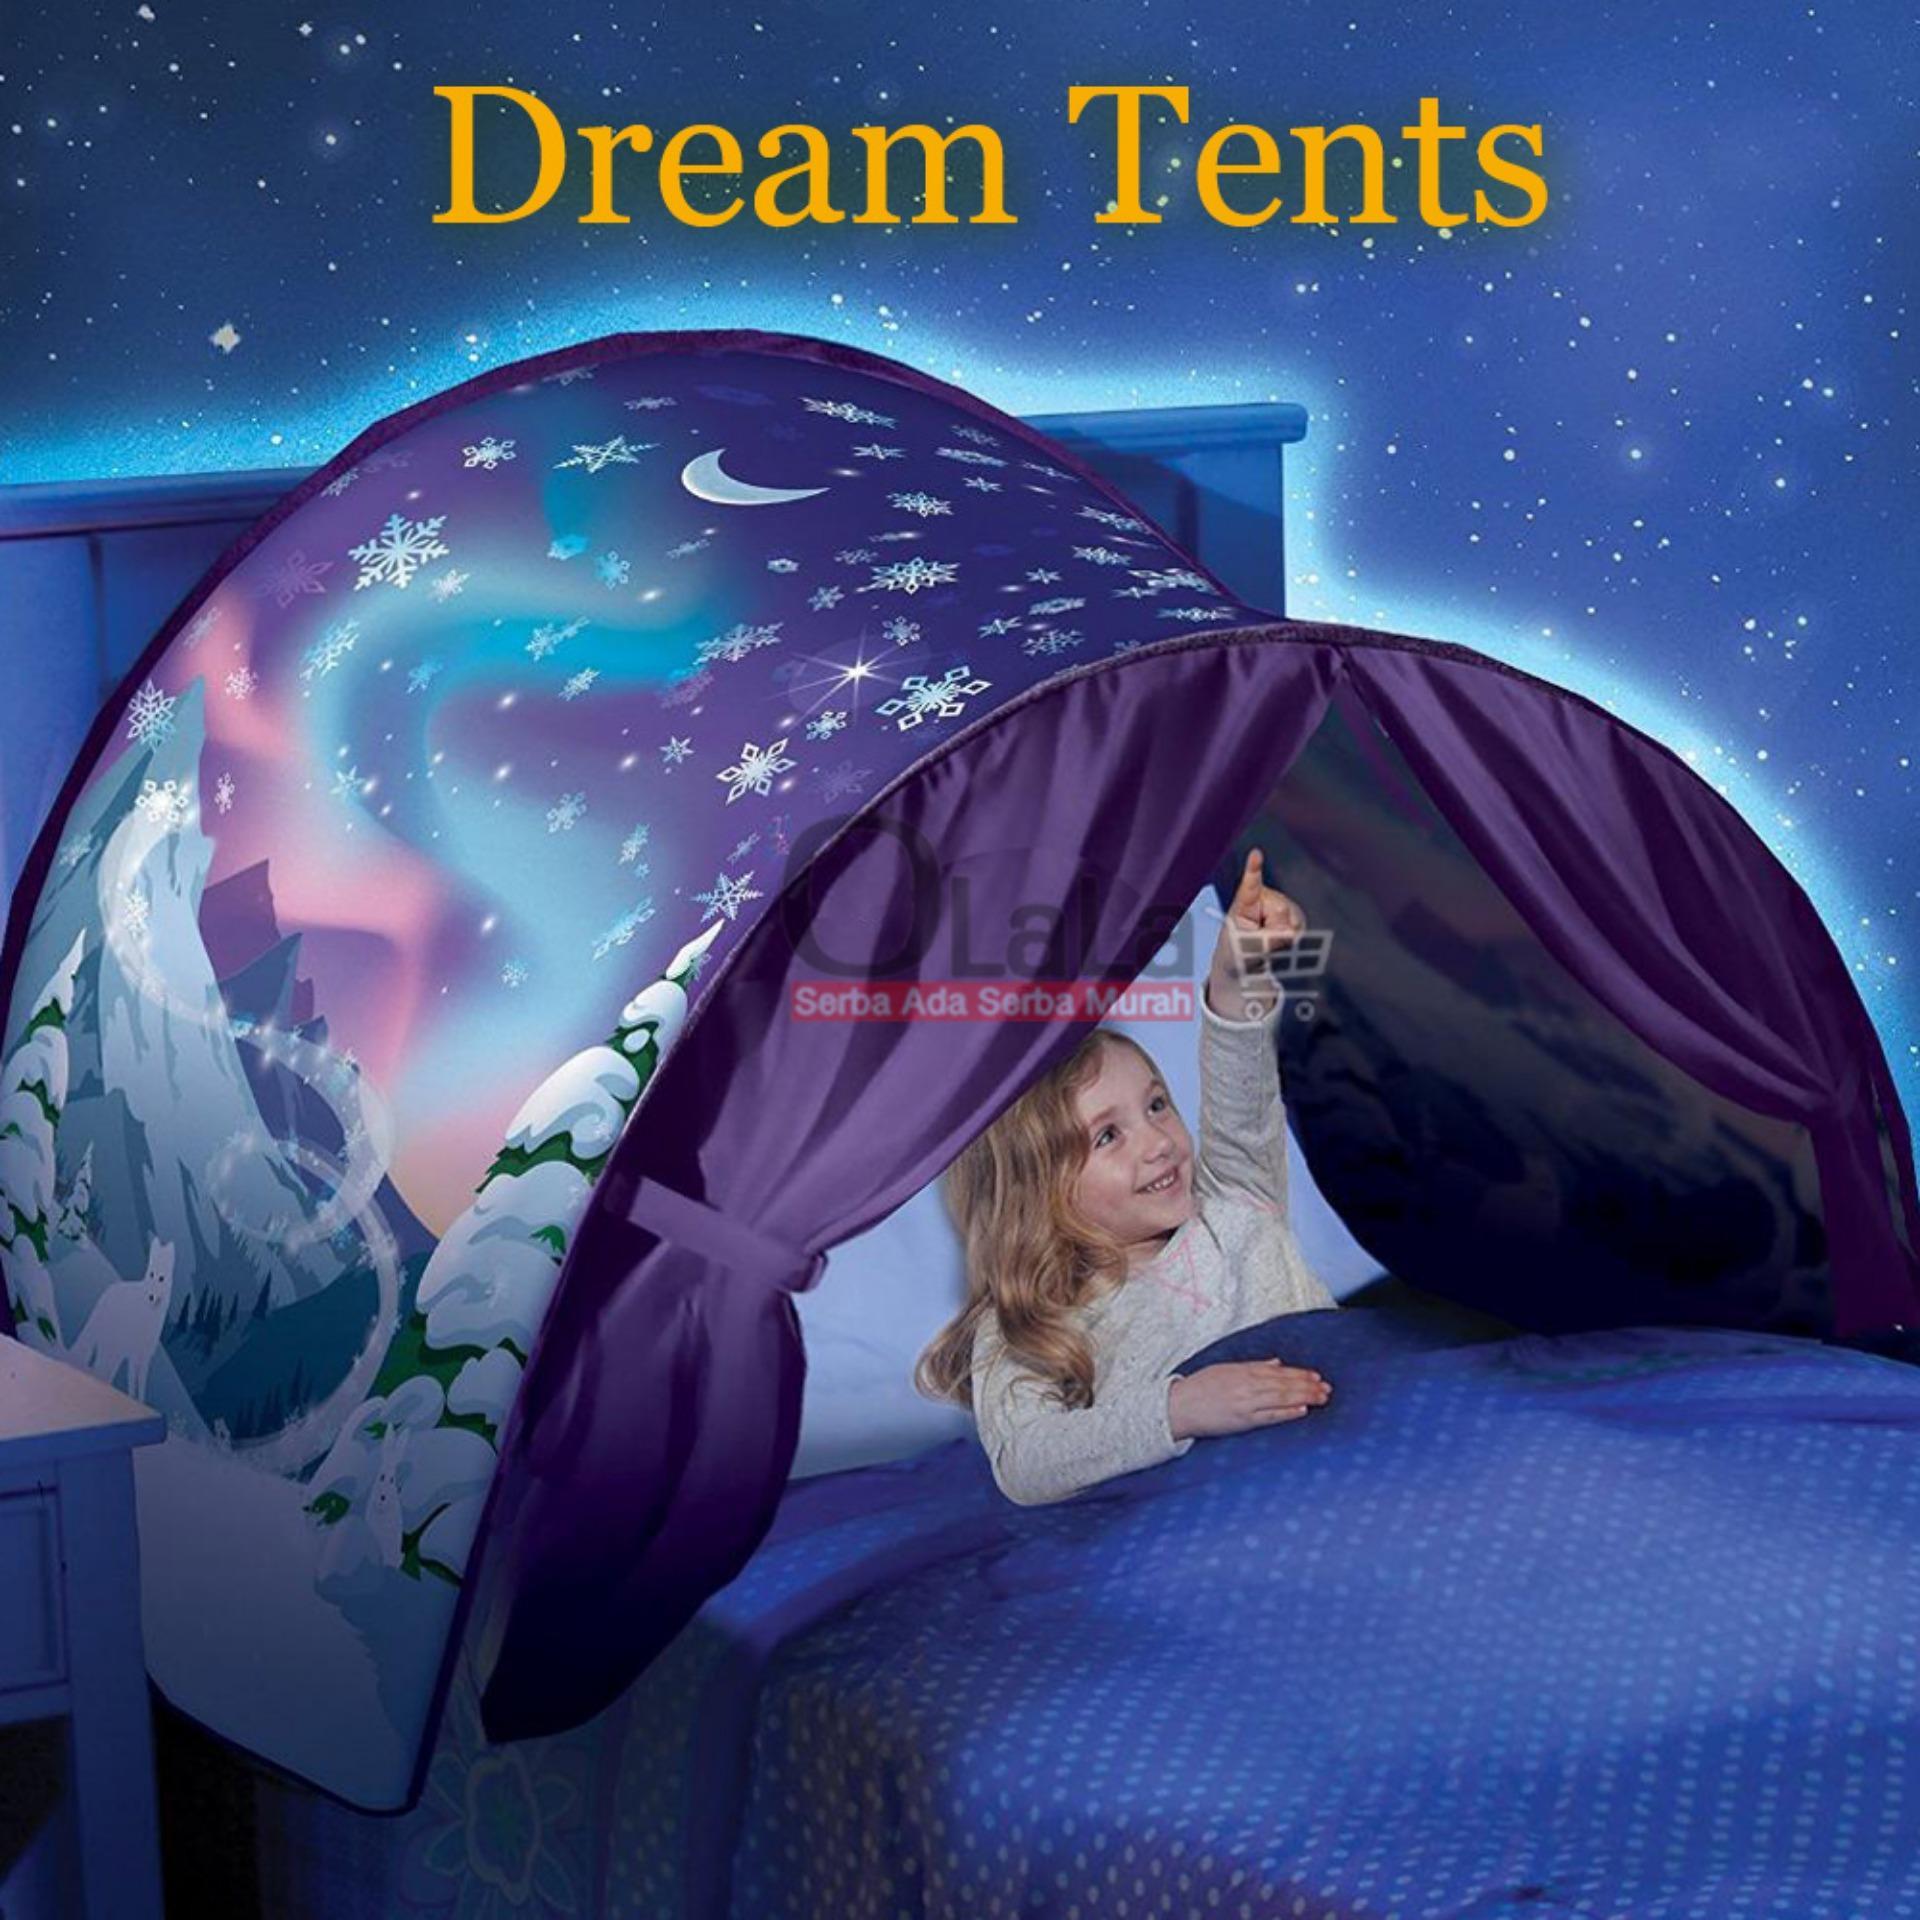 Tenda Anak Dream Tents / Tenda Tempat Tidur Anak Lx-907 By Olala Jakarta